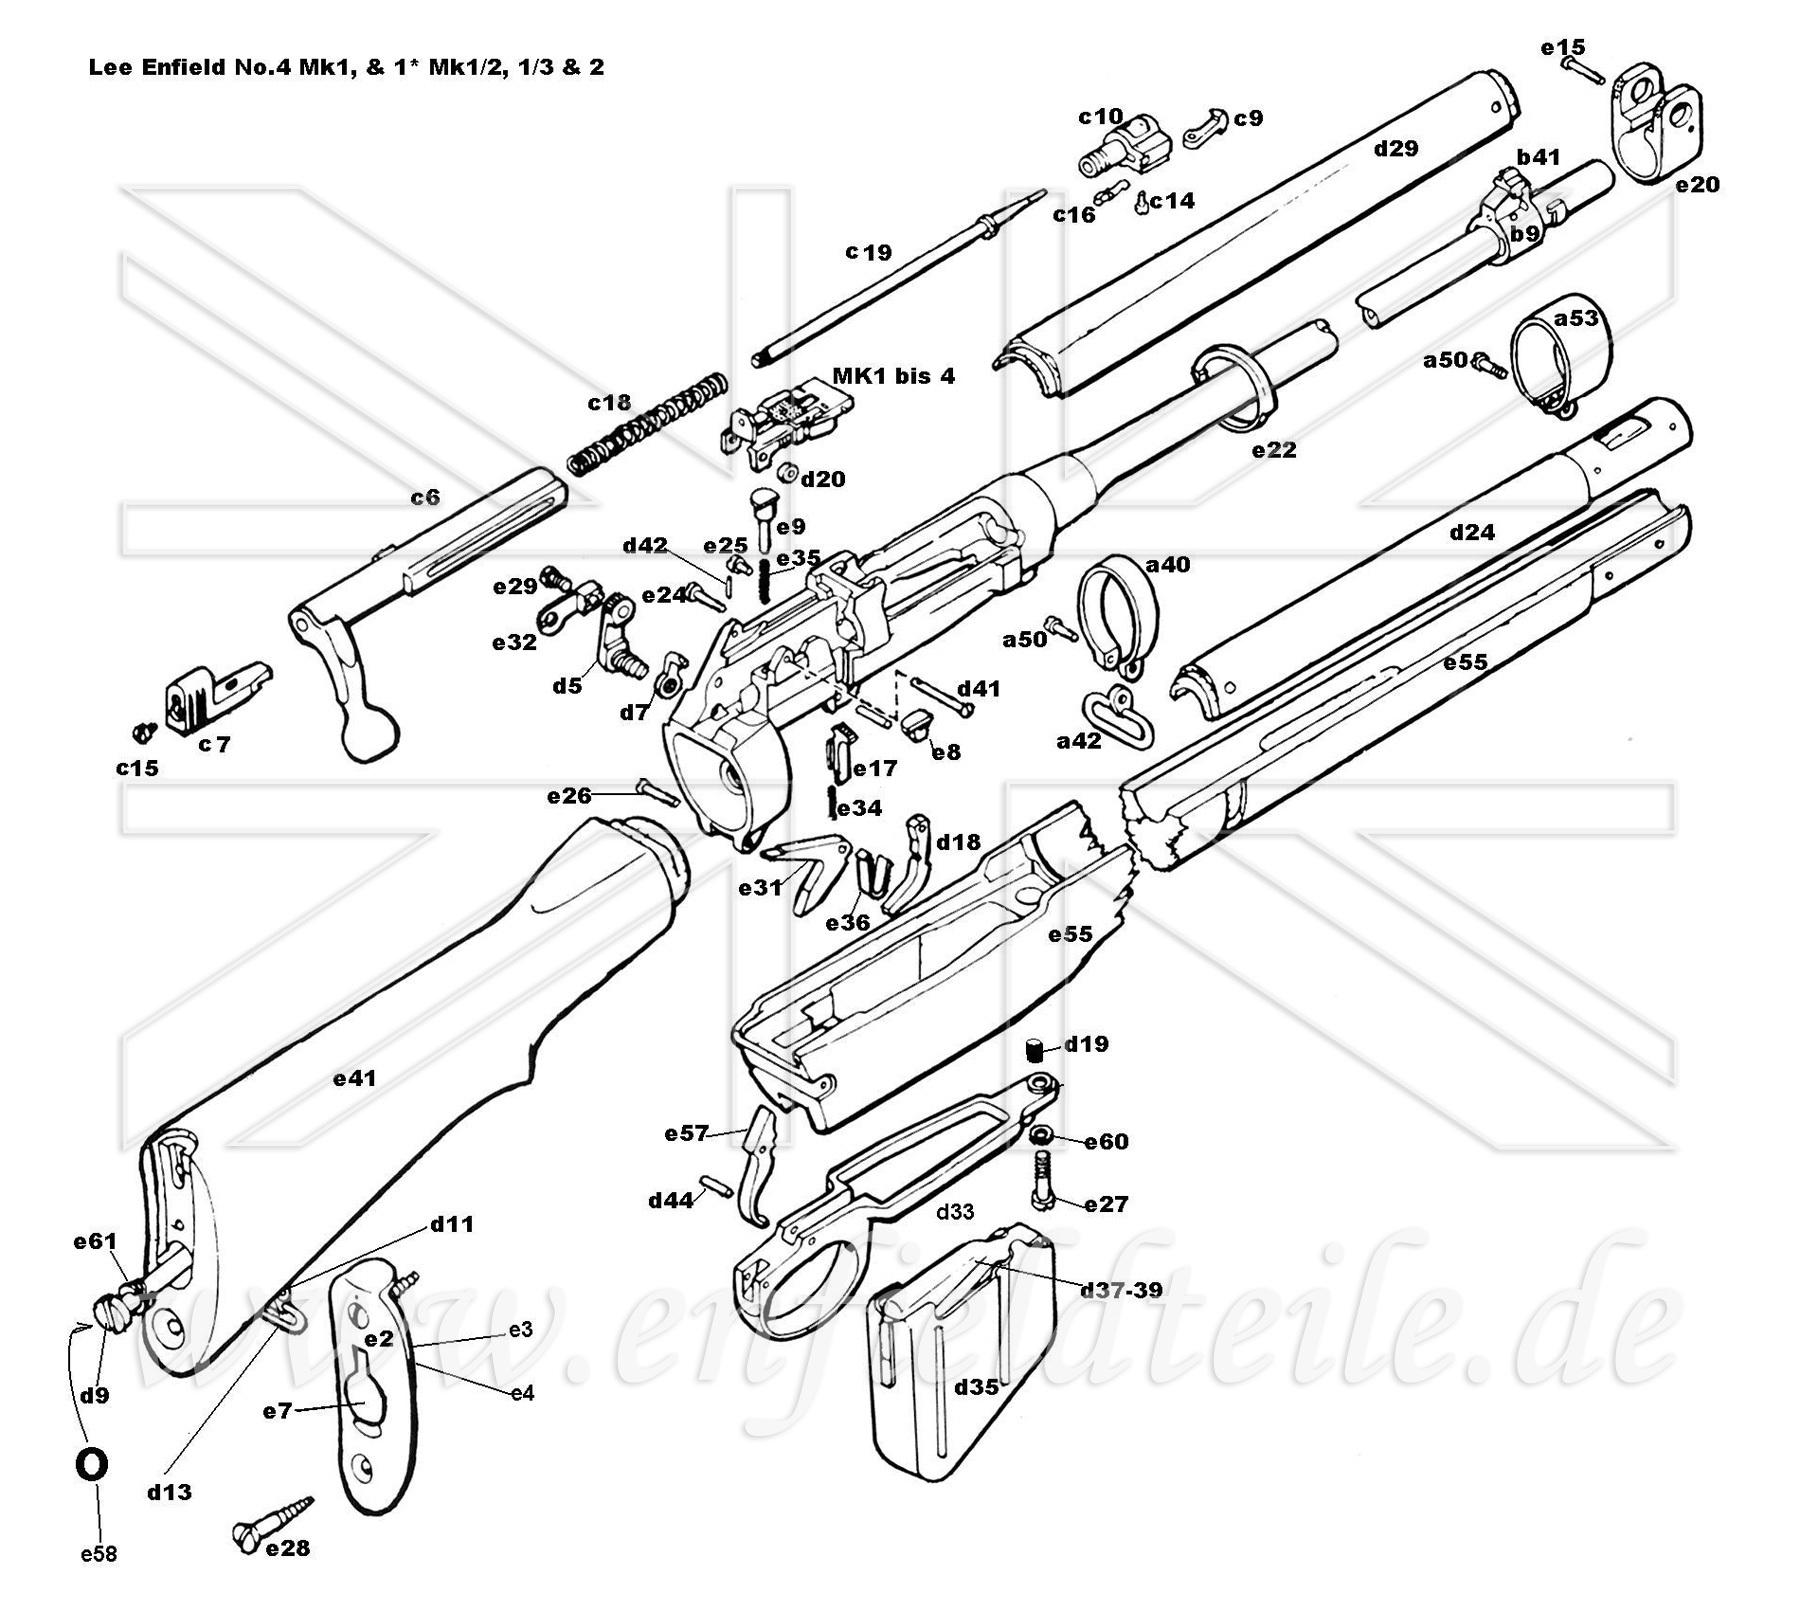 p14 enfield parts